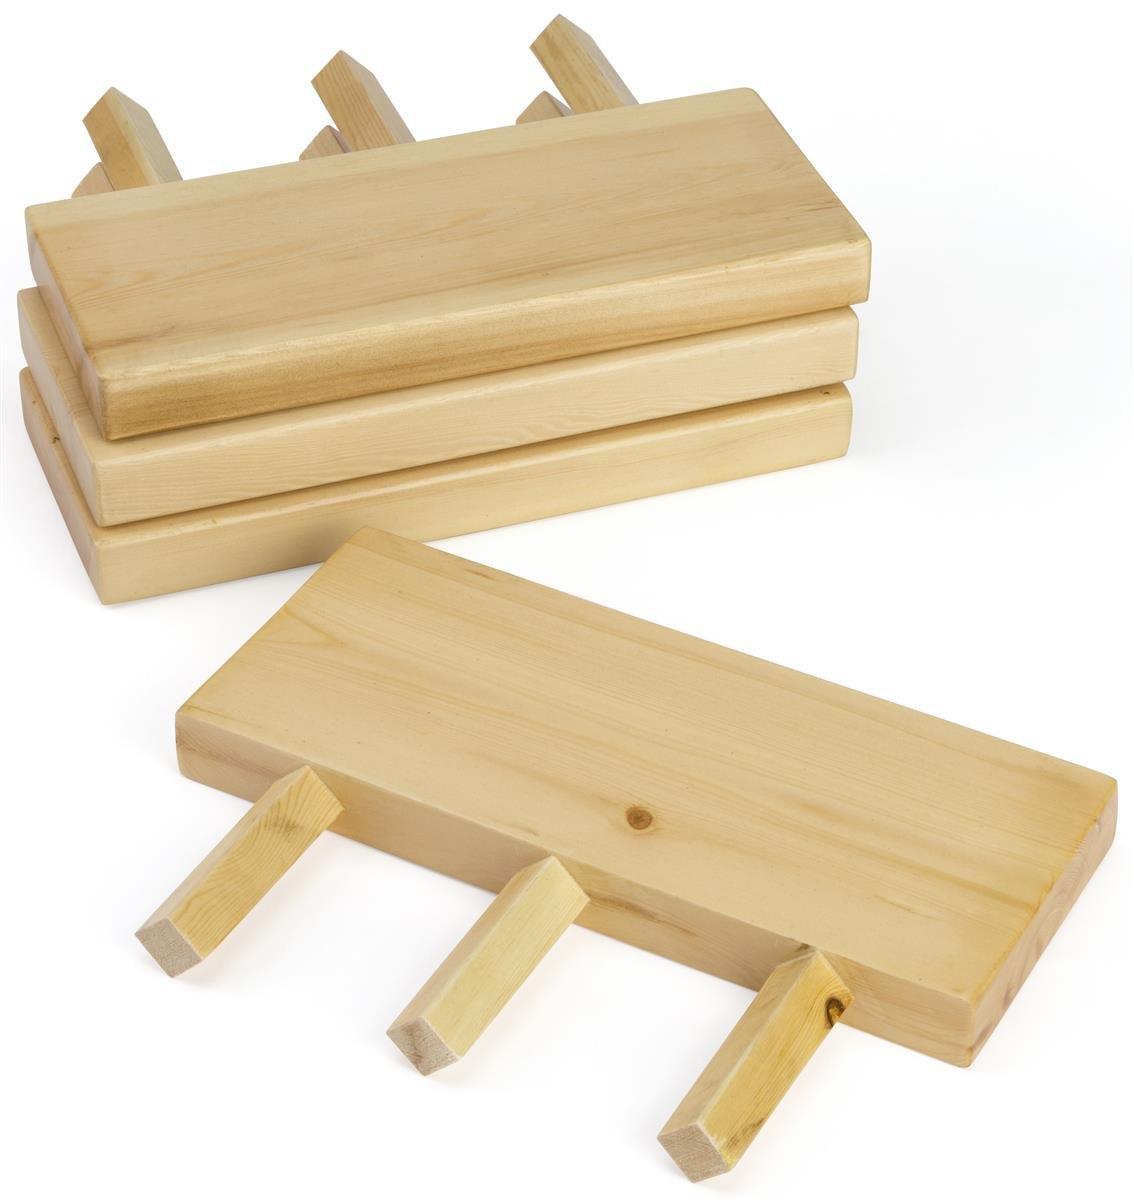 Displays2go 14'' w x 6'' d Dowel Peg Slatwall Shelves, Set of 4 - Natural Wood Finish (CRSSHLFST4)